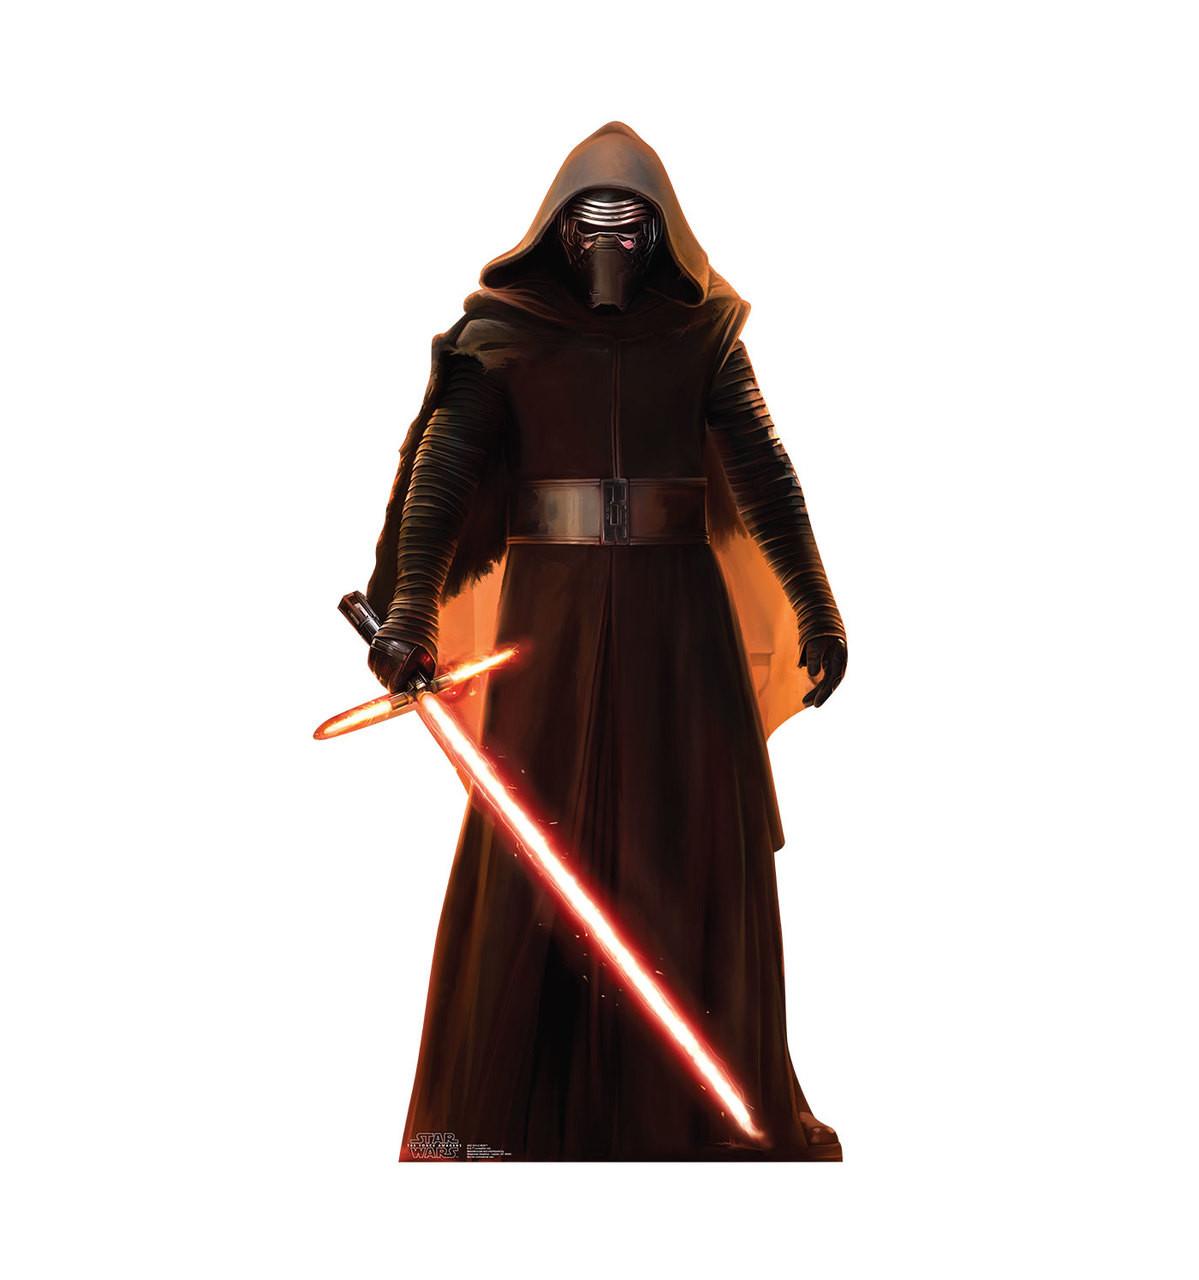 Kylo Ren - Star Wars: The Force Awakens - Cardboard Cutout 2031